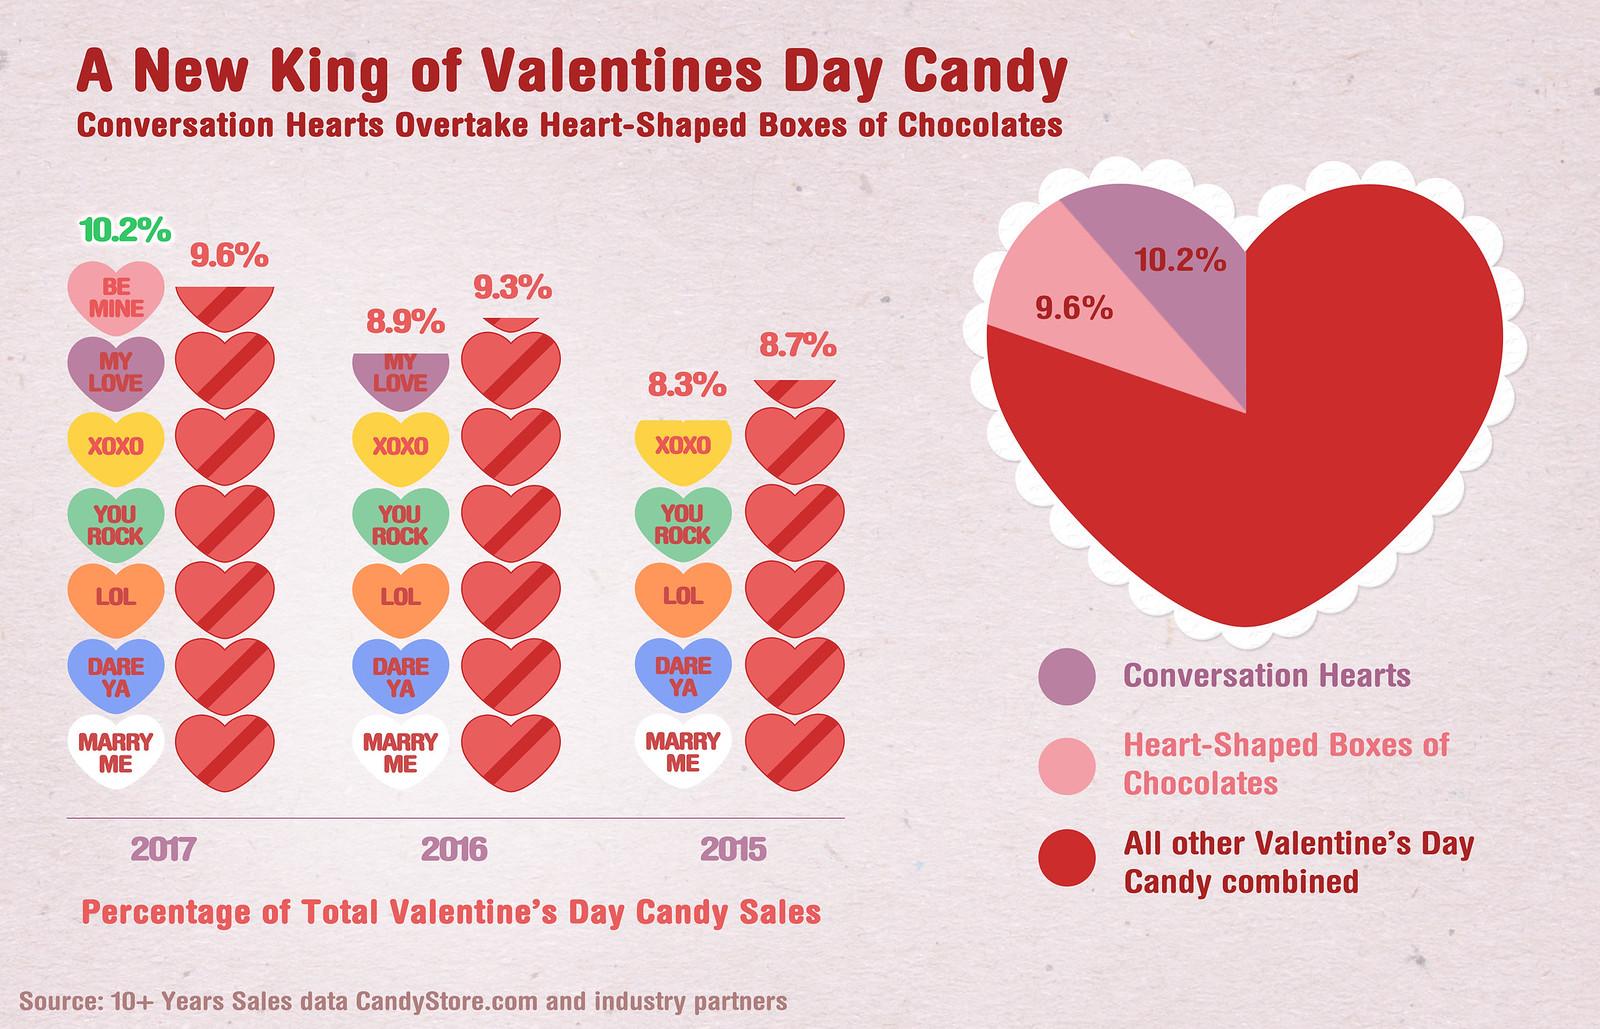 Conversation Hearts Are Nj Nation S Favorite Valentine S